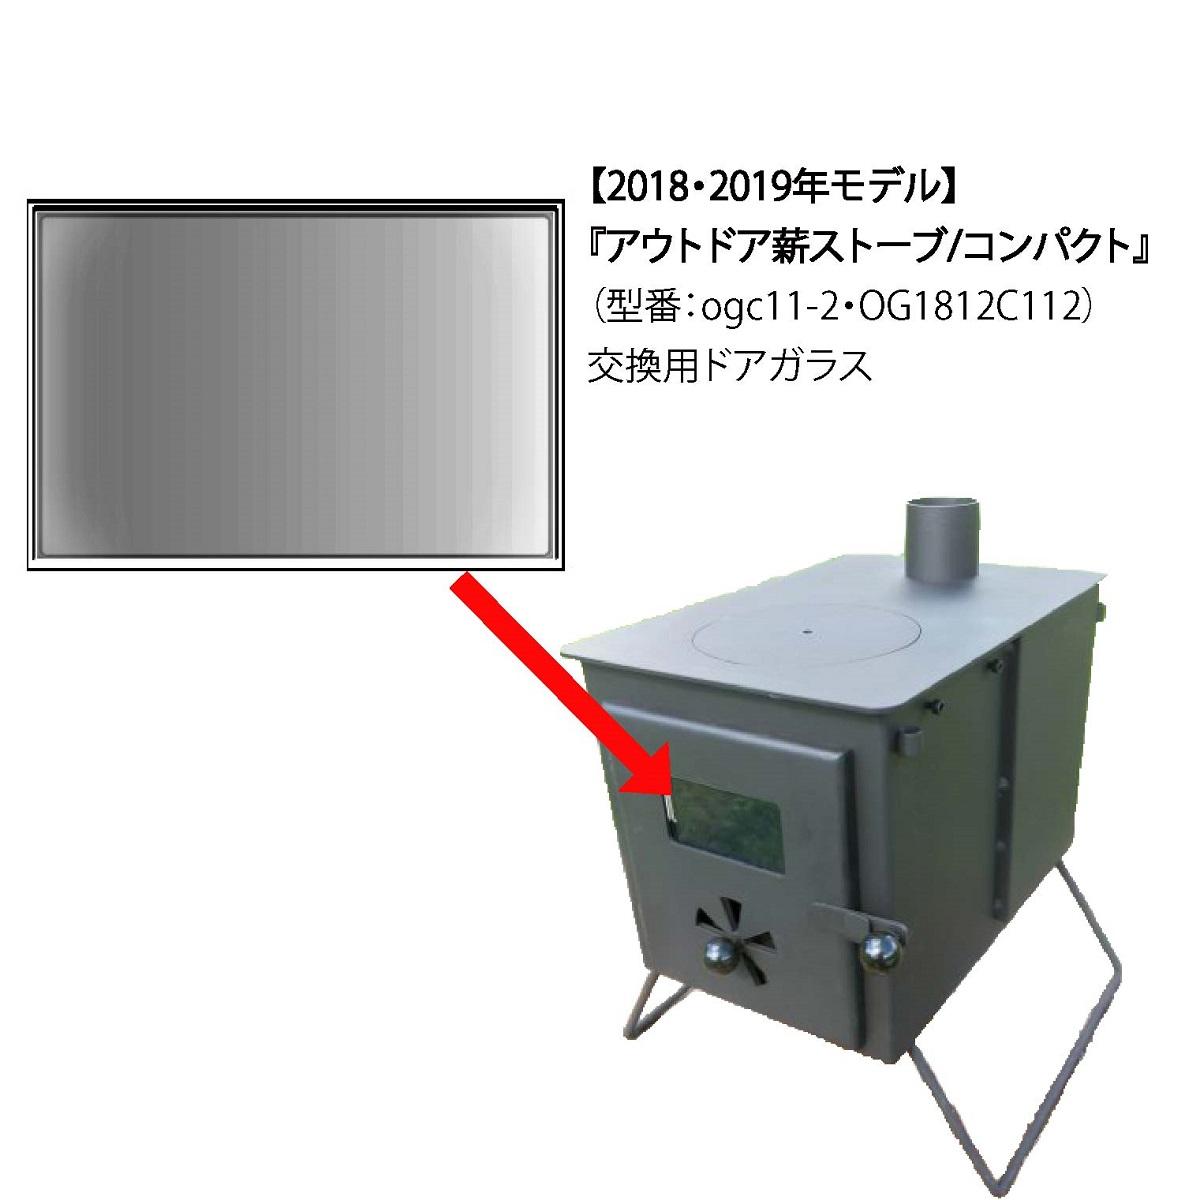 Locomoアウトドア薪ストーブ/コンパクト用交換ガラス